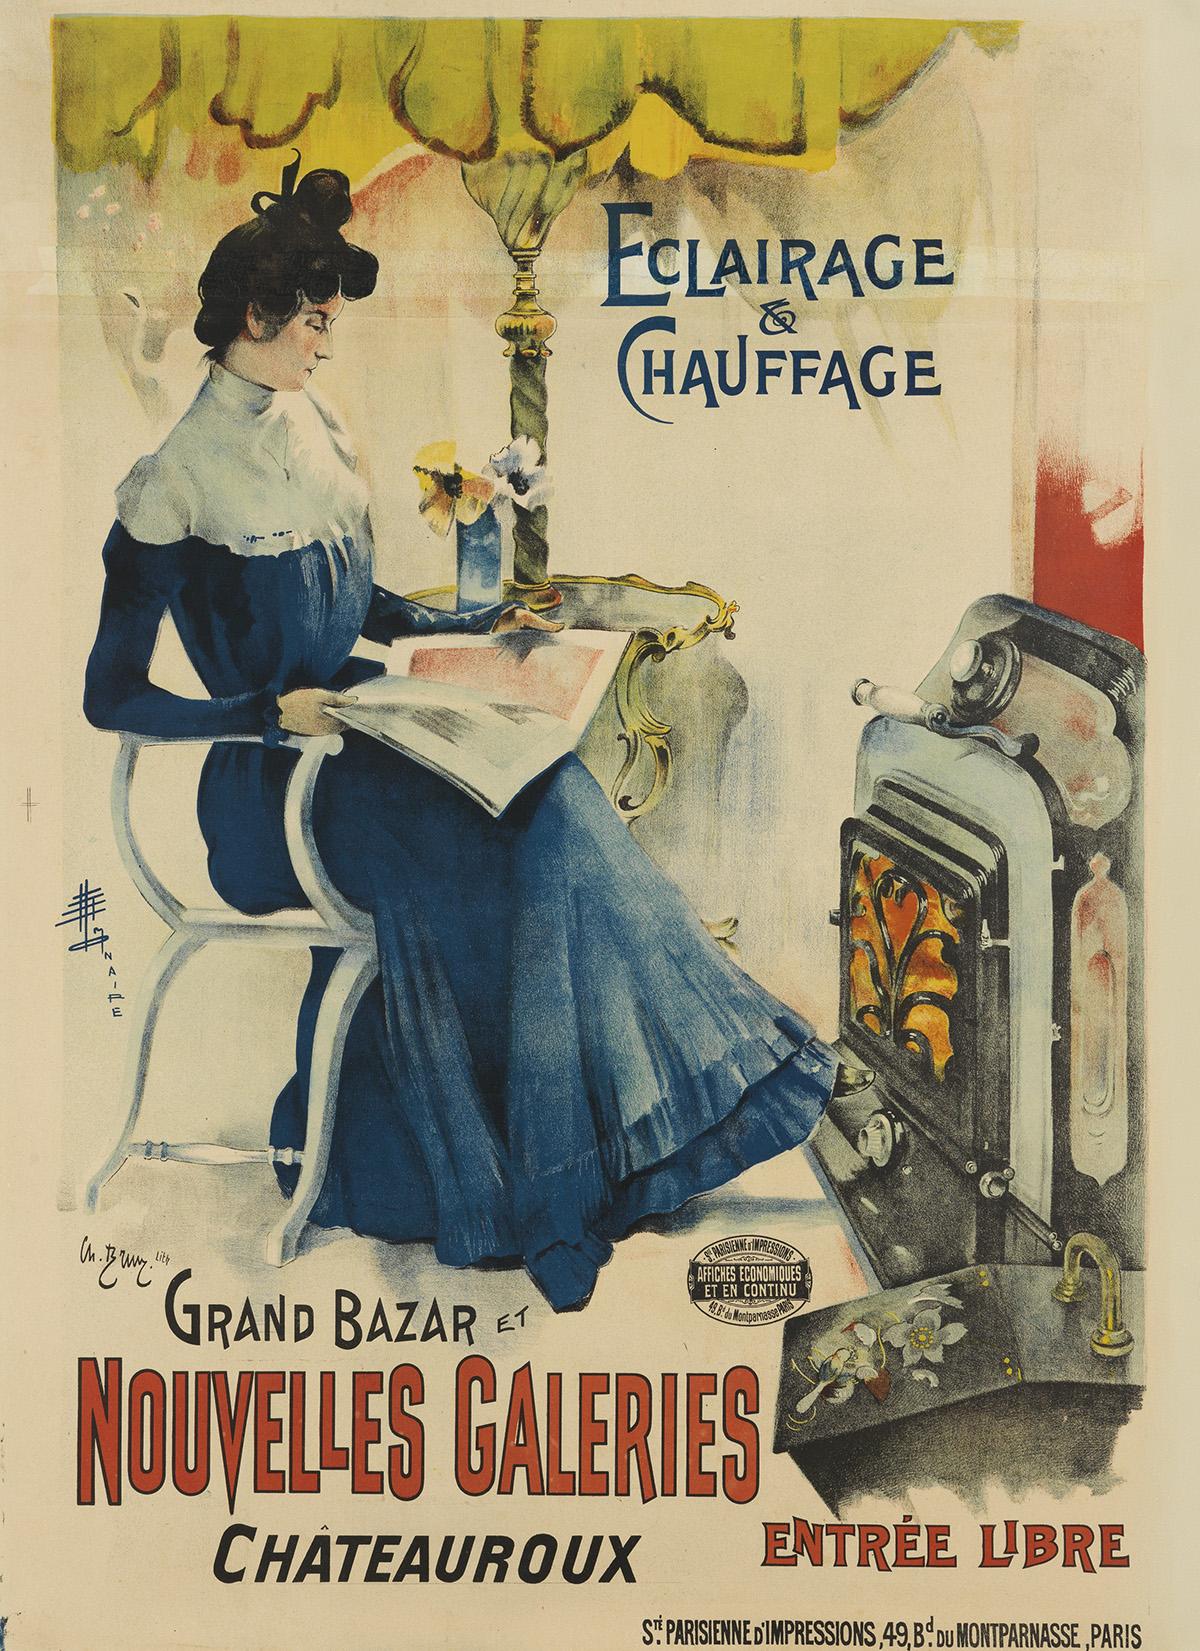 MONAIRE (DATES UNKNOWN). ECLAIRAGE & CHAUFFAGE / GRAND BAZAR ET NOUVELLES GALERIES. Circa 1895. 47x34 inches, 119x87 cm. Ch. Brun Lith.